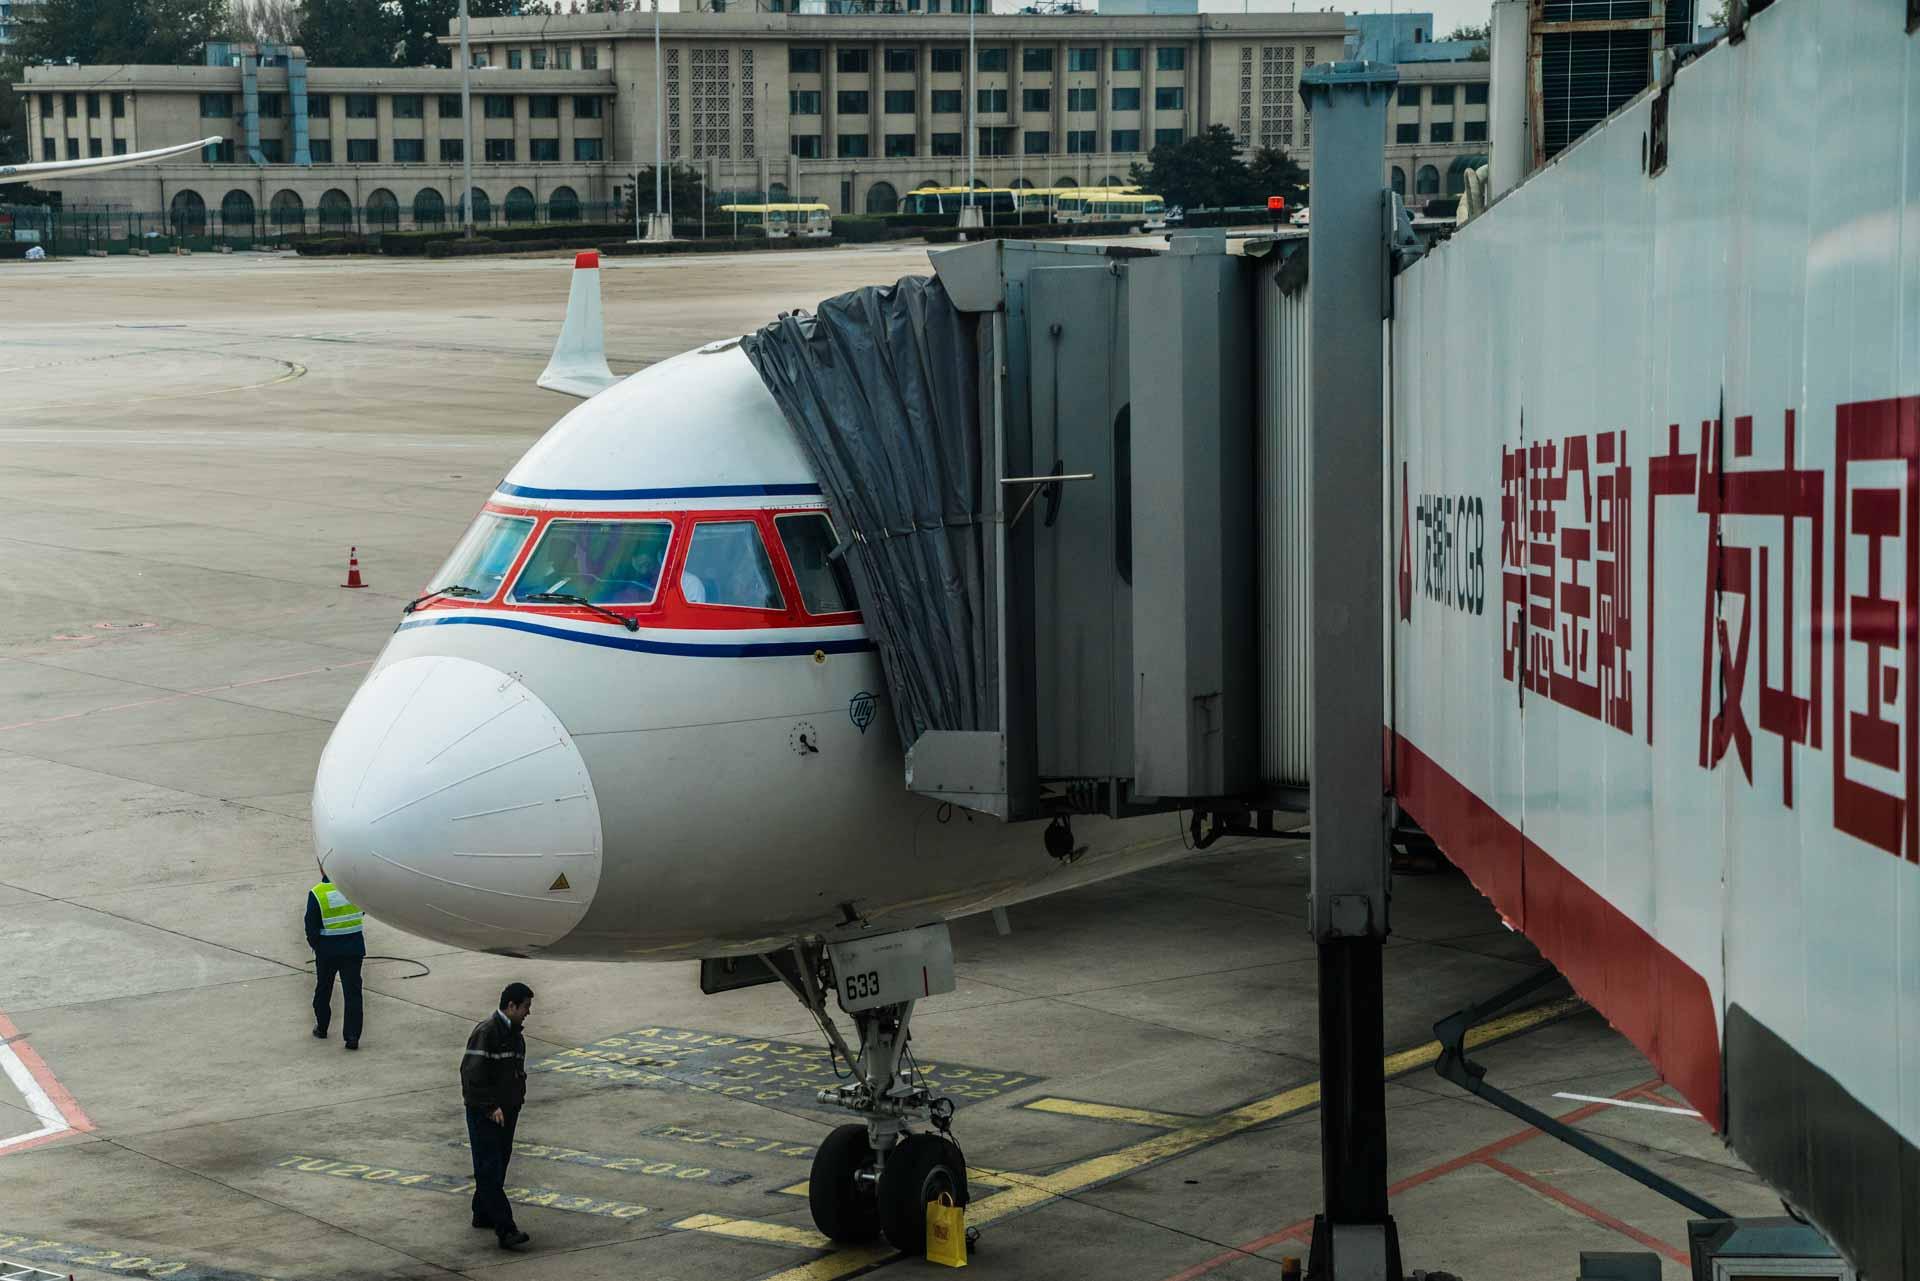 A Red Superhero in North Korea Enrico Pescantini koryo airline